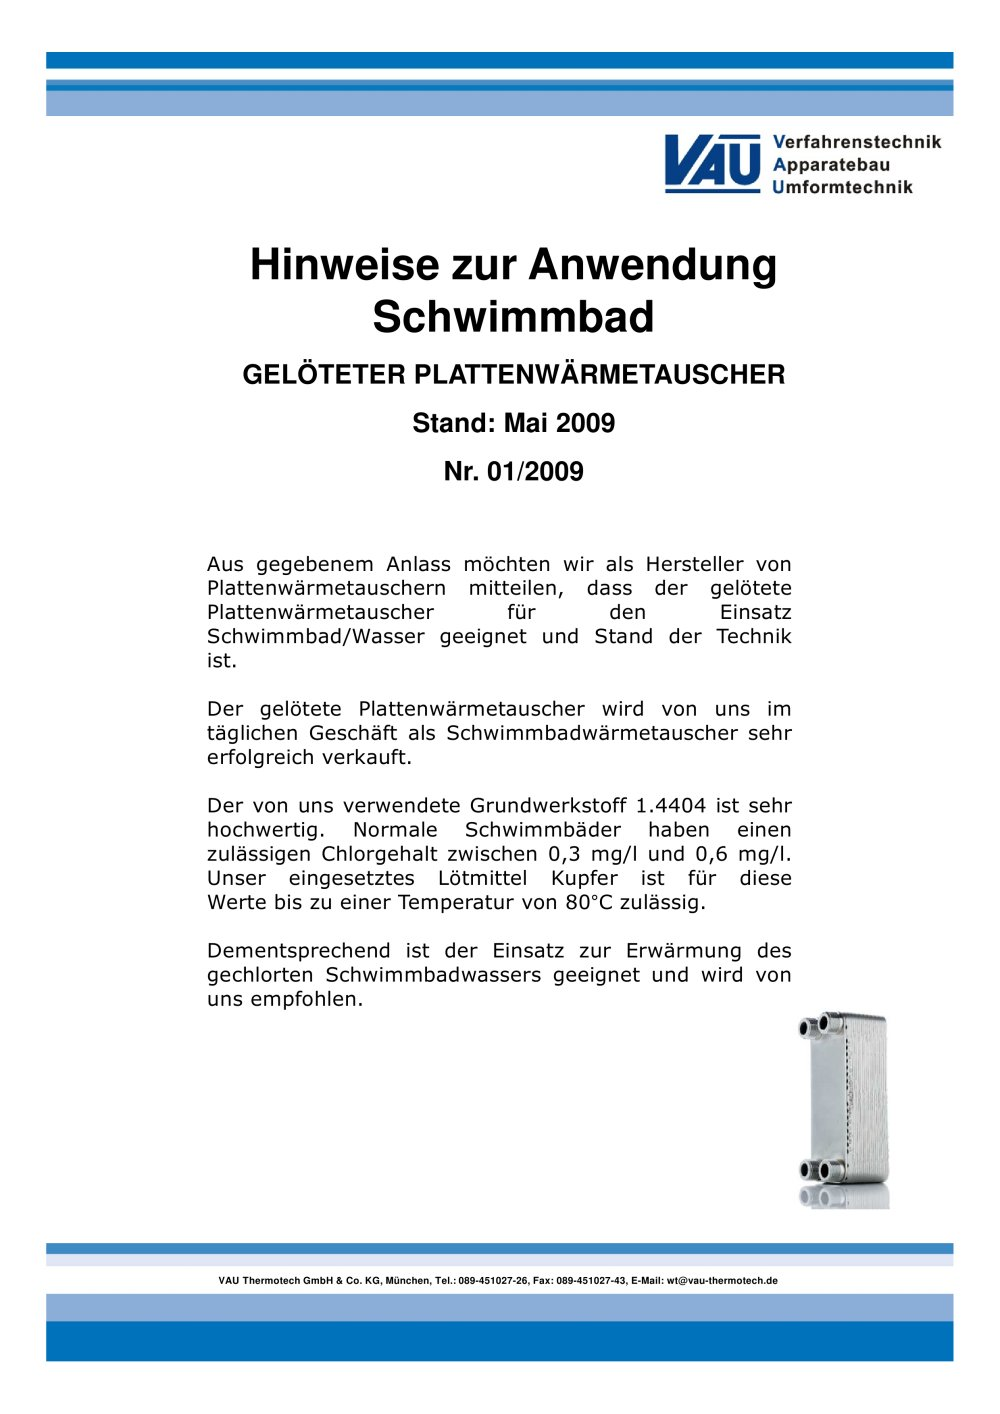 Hinweise zur Anwendung Schwimmbad - VAU Thermotech GmbH & Co. KG ...